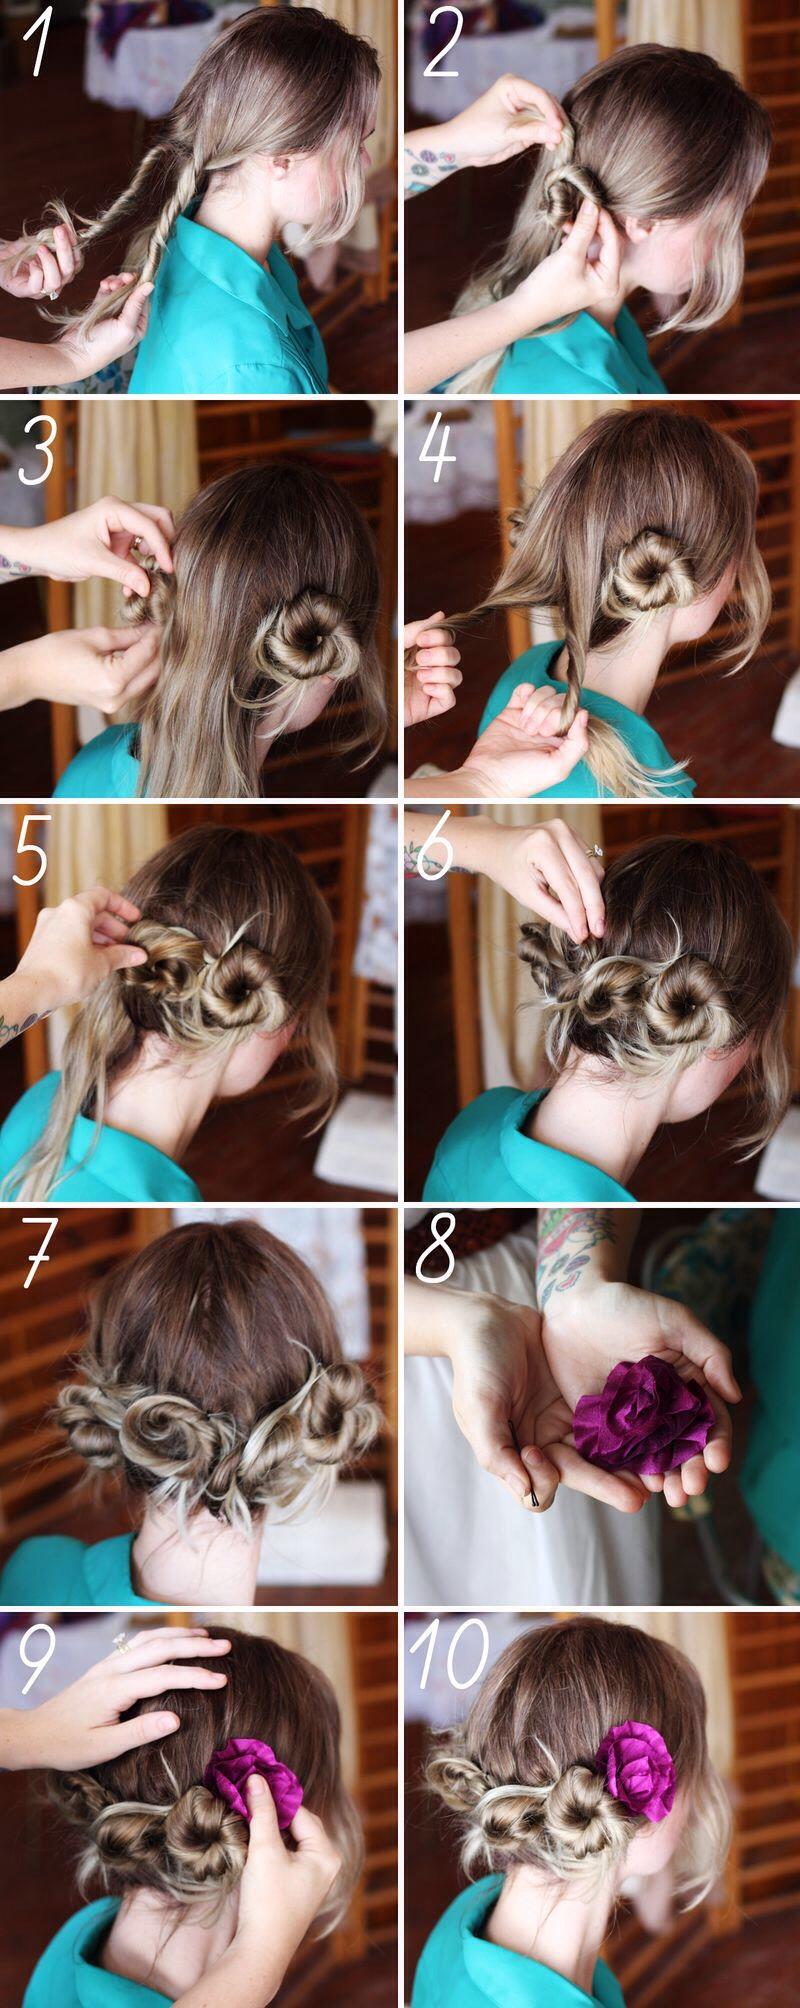 Причёски на себе своими руками видео